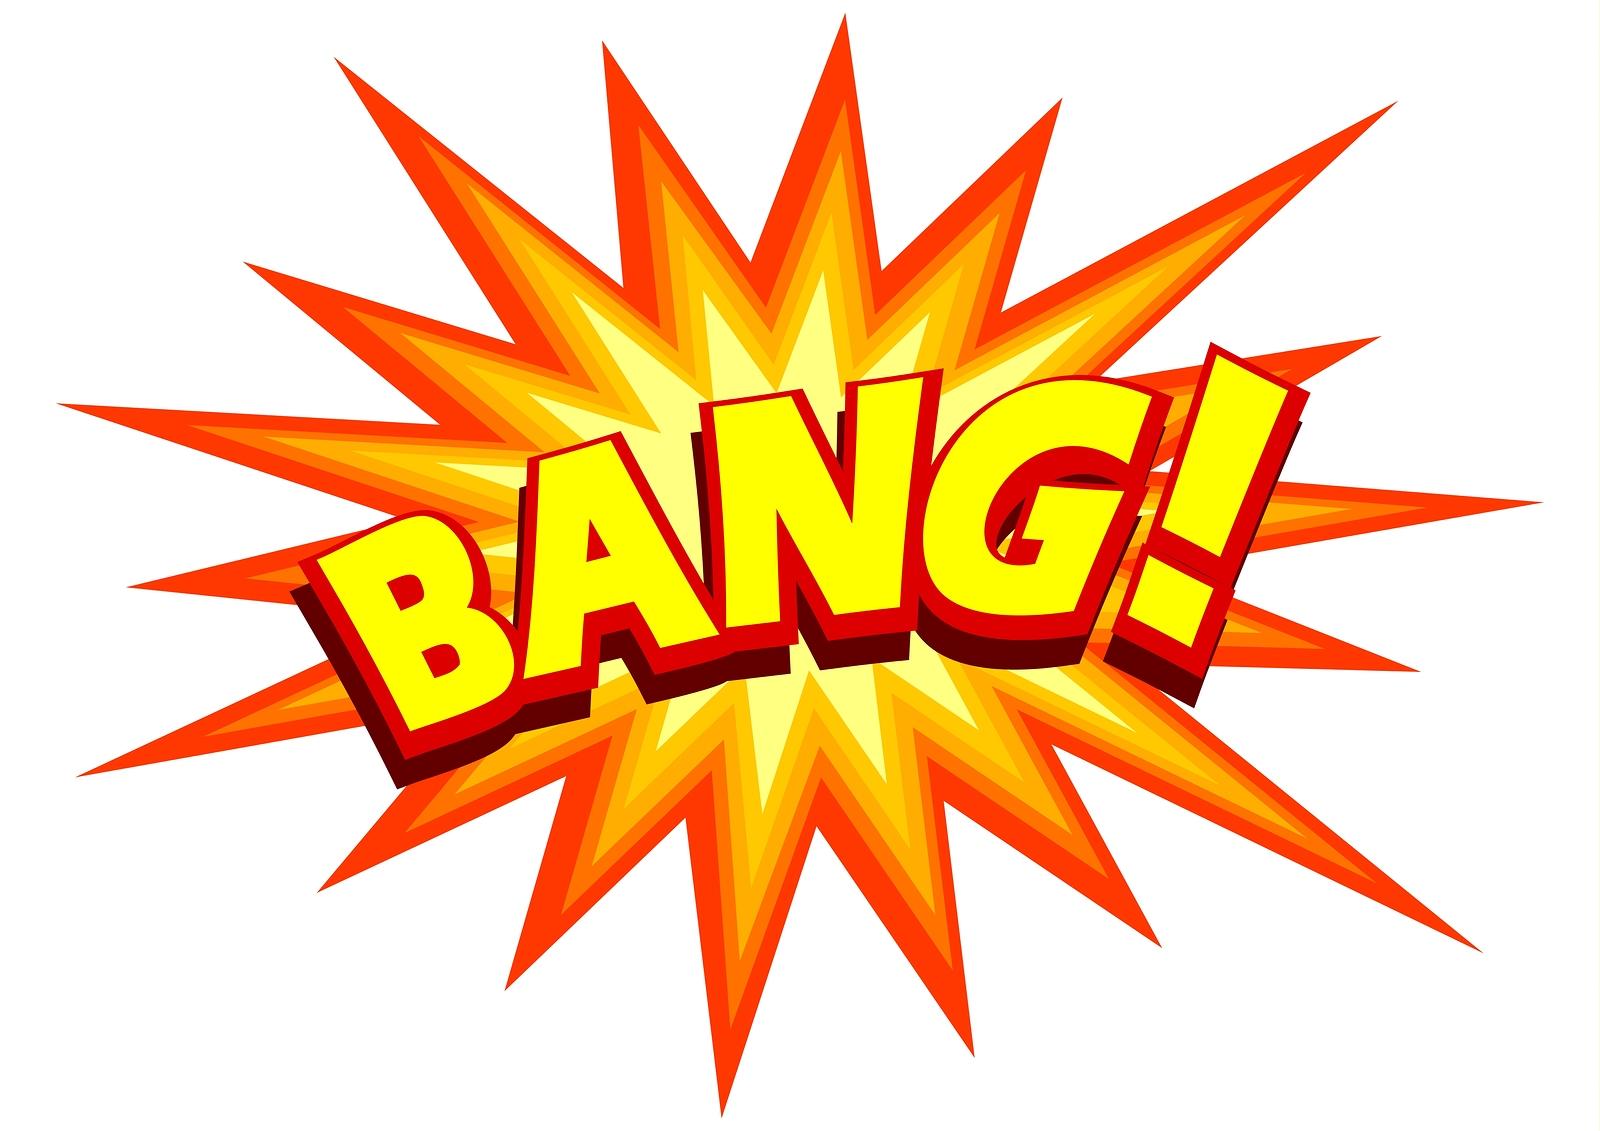 Pierre clipart abs jpg royalty free stock Sabine Hossenfelder: Backreaction: Recreating the Big Bang? jpg royalty free stock